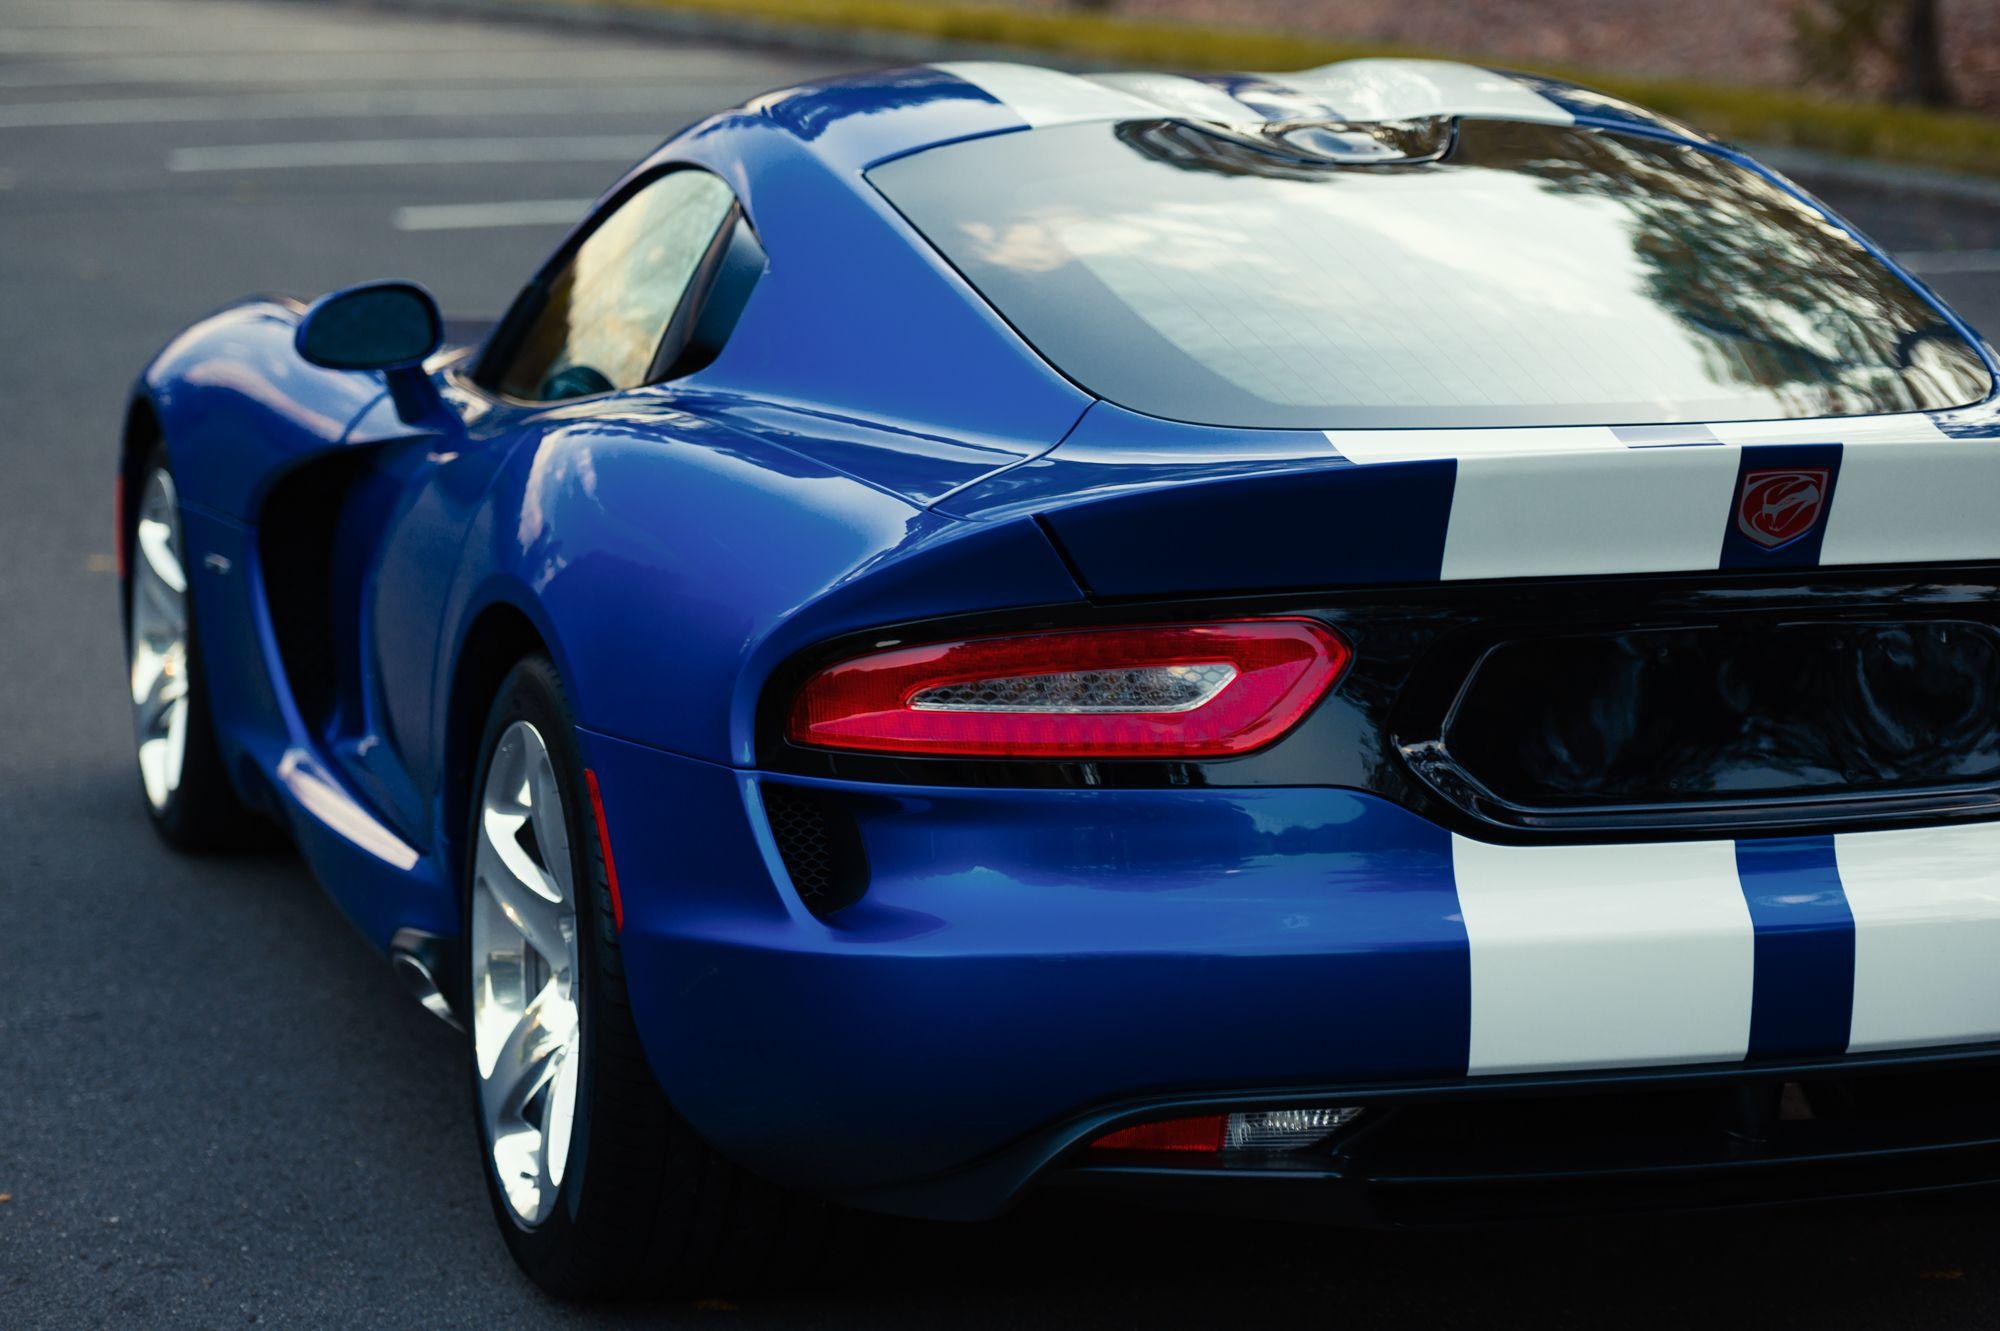 870 Mile 2013 Srt Viper Gts 6 Speed Viper Gts Srt Dodge Viper